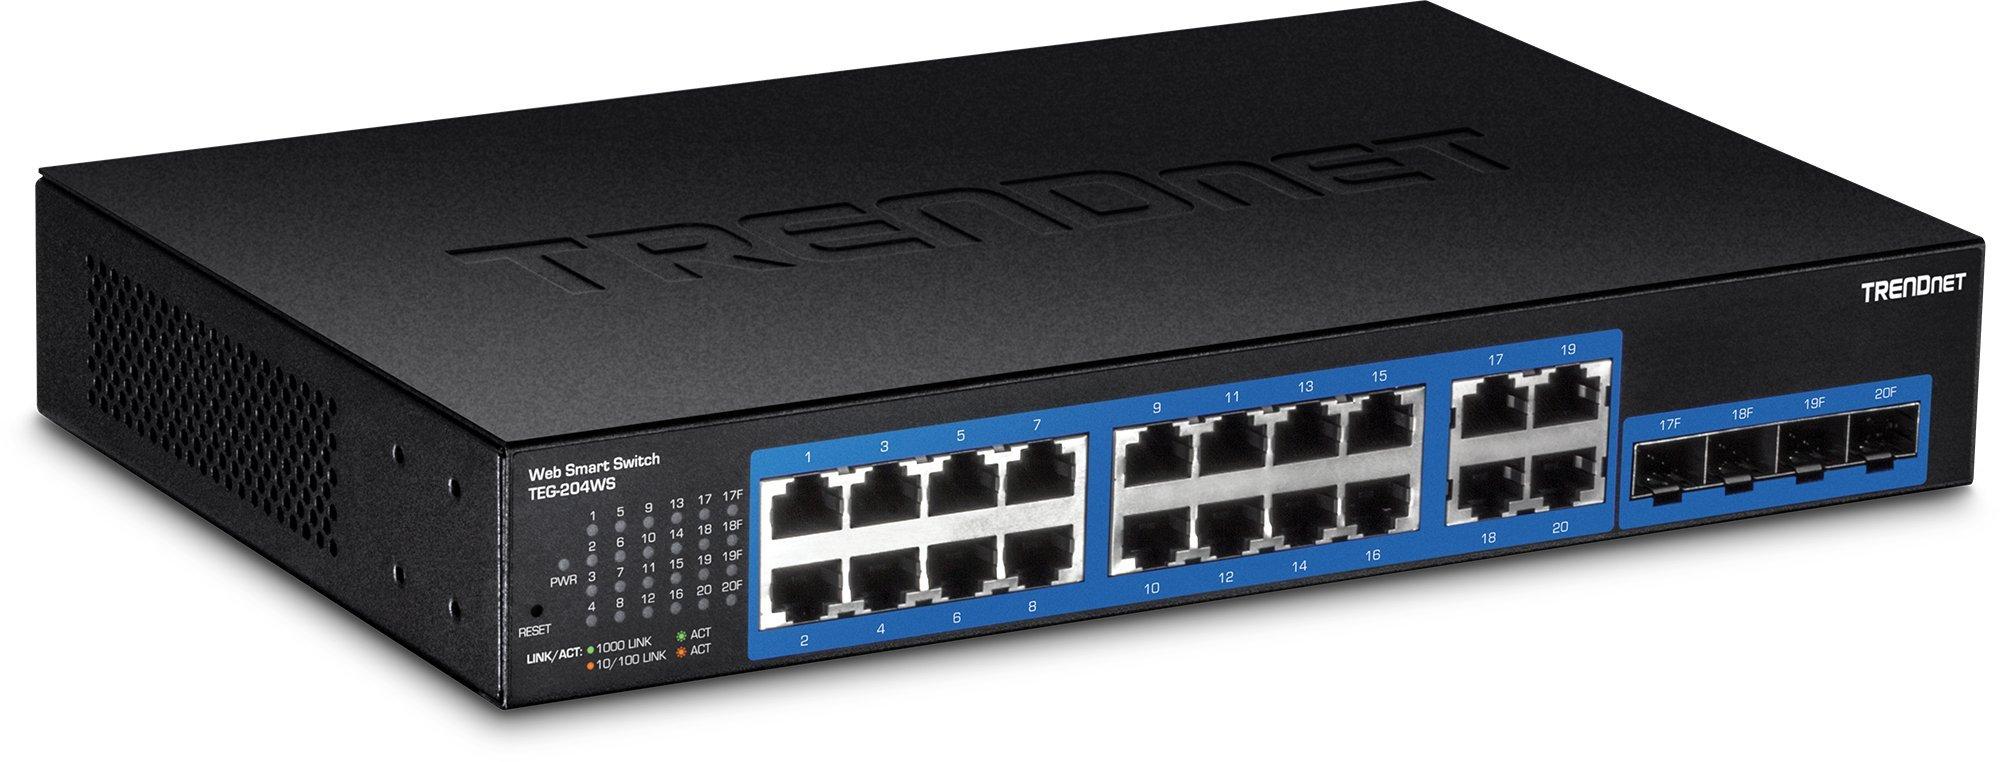 TRENDnet 20-Port Gigabit Web Smart Switch, 16 x Gigabit Ports, 4 x shared Gigabit Ports (RJ-45/SFP), VLAN, QoS, LACP, IPv6 Support, 40 Gbps Switching Capacity, TEG-204WS by TRENDnet (Image #1)